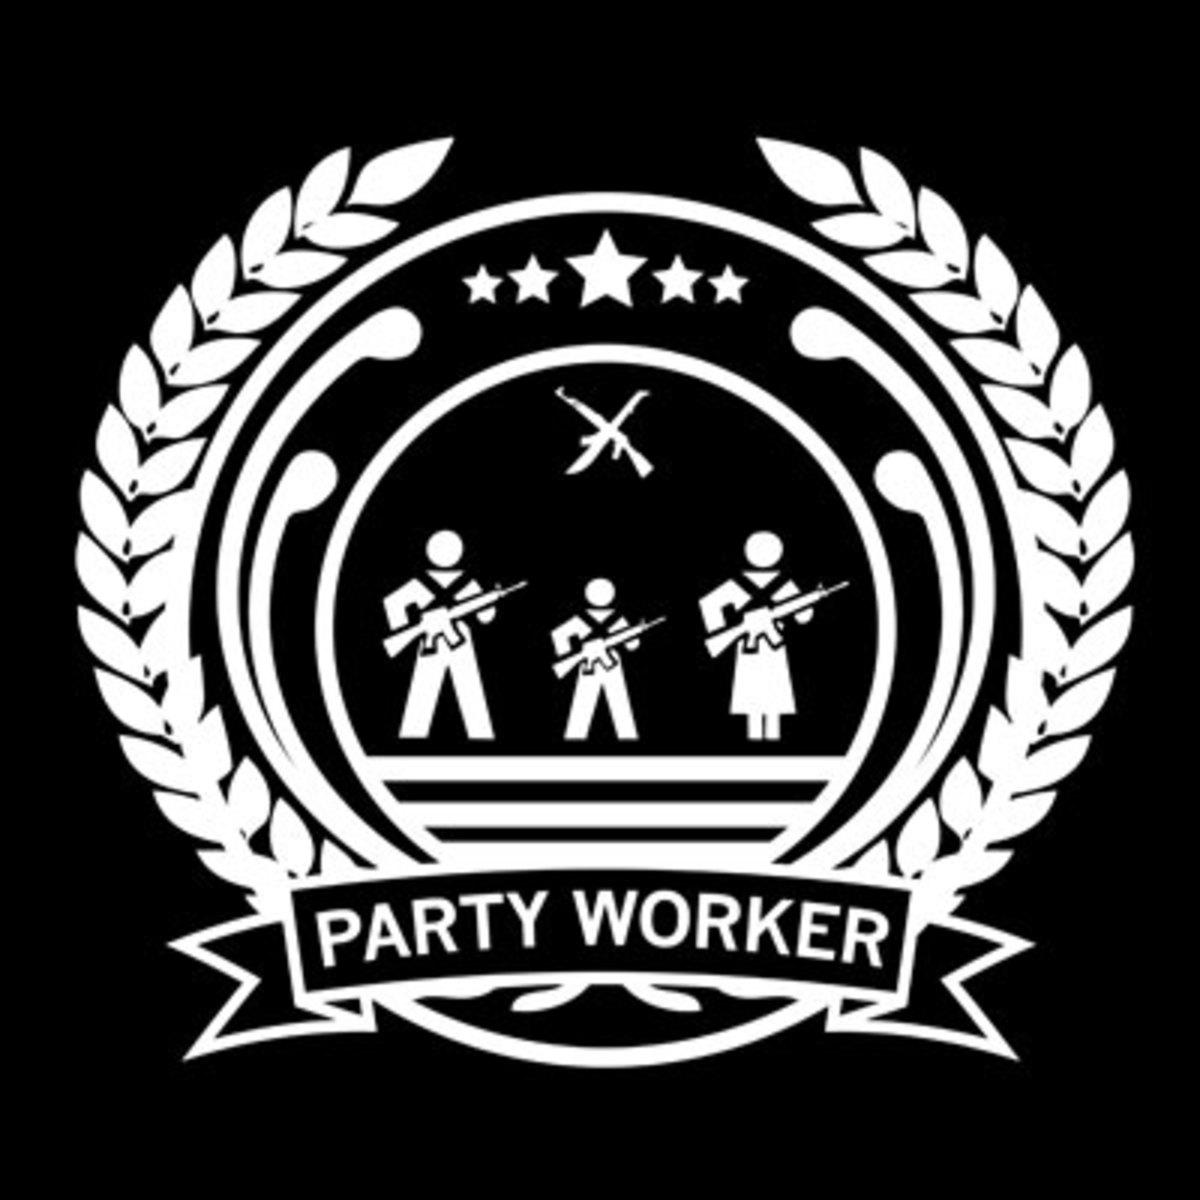 bambu-partyworker.jpg